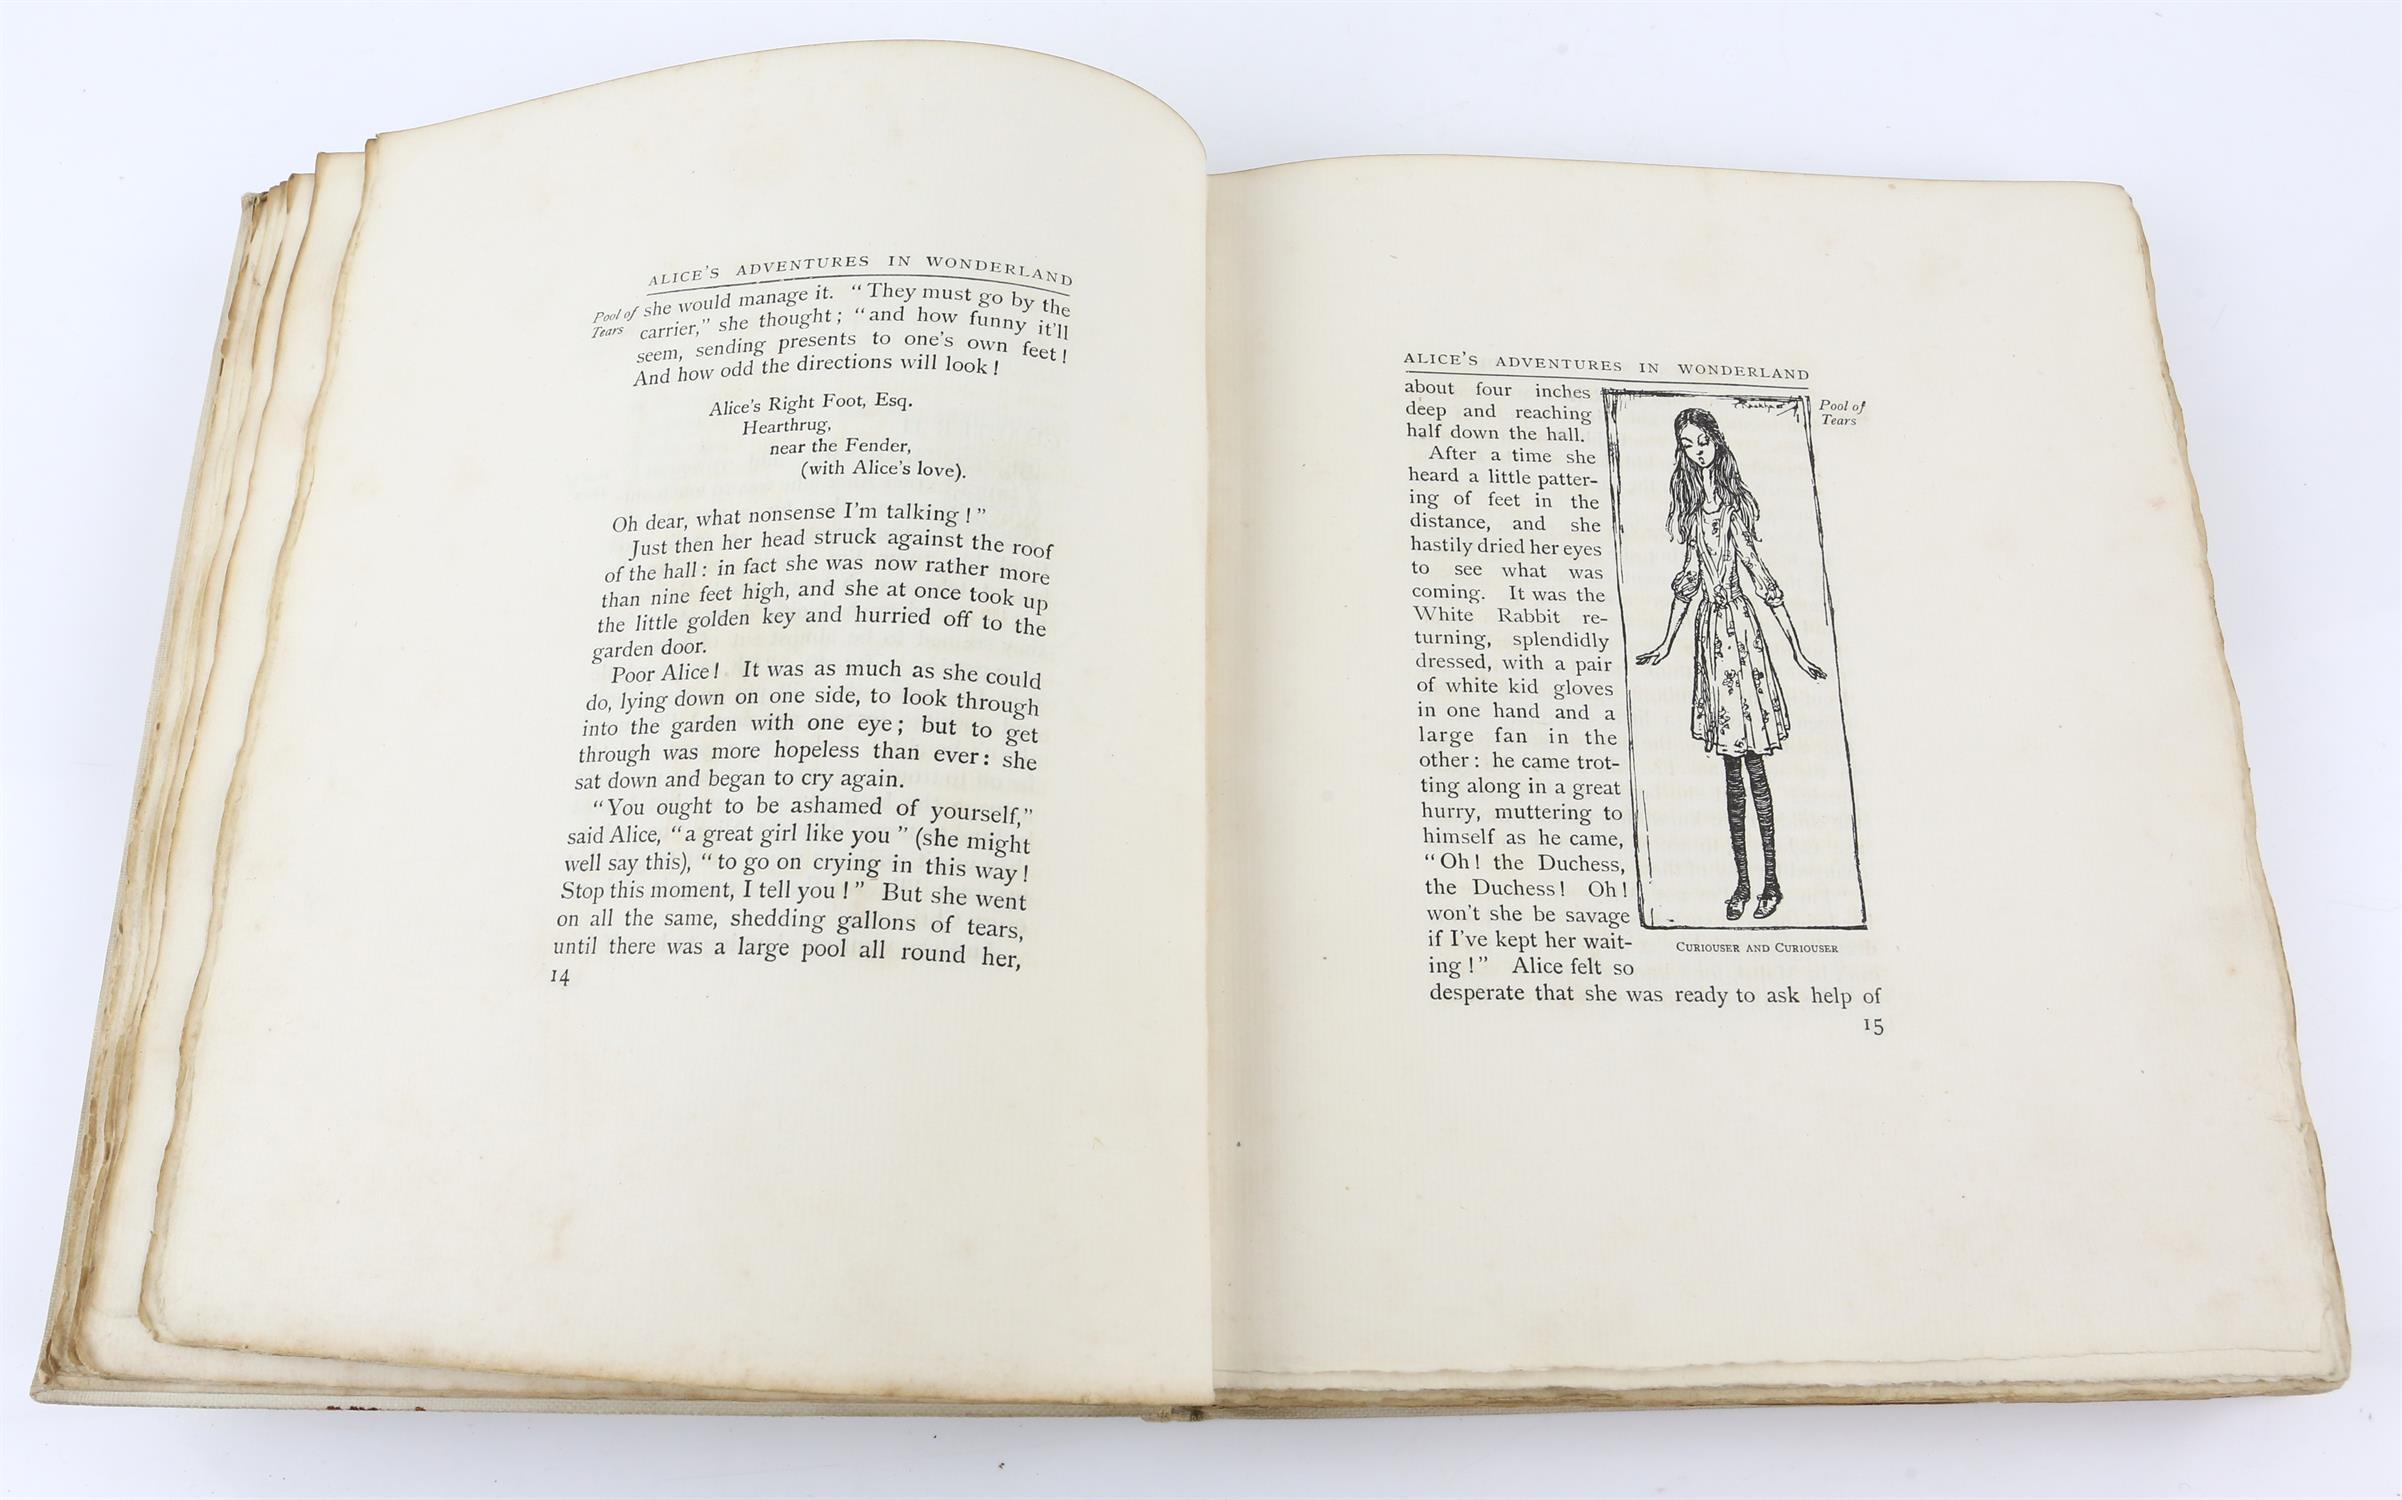 Carroll, Lewis, Alice's Adventures in Wonderland, illustrated by Arthur Rackham.W.Heinemann, - Image 11 of 17